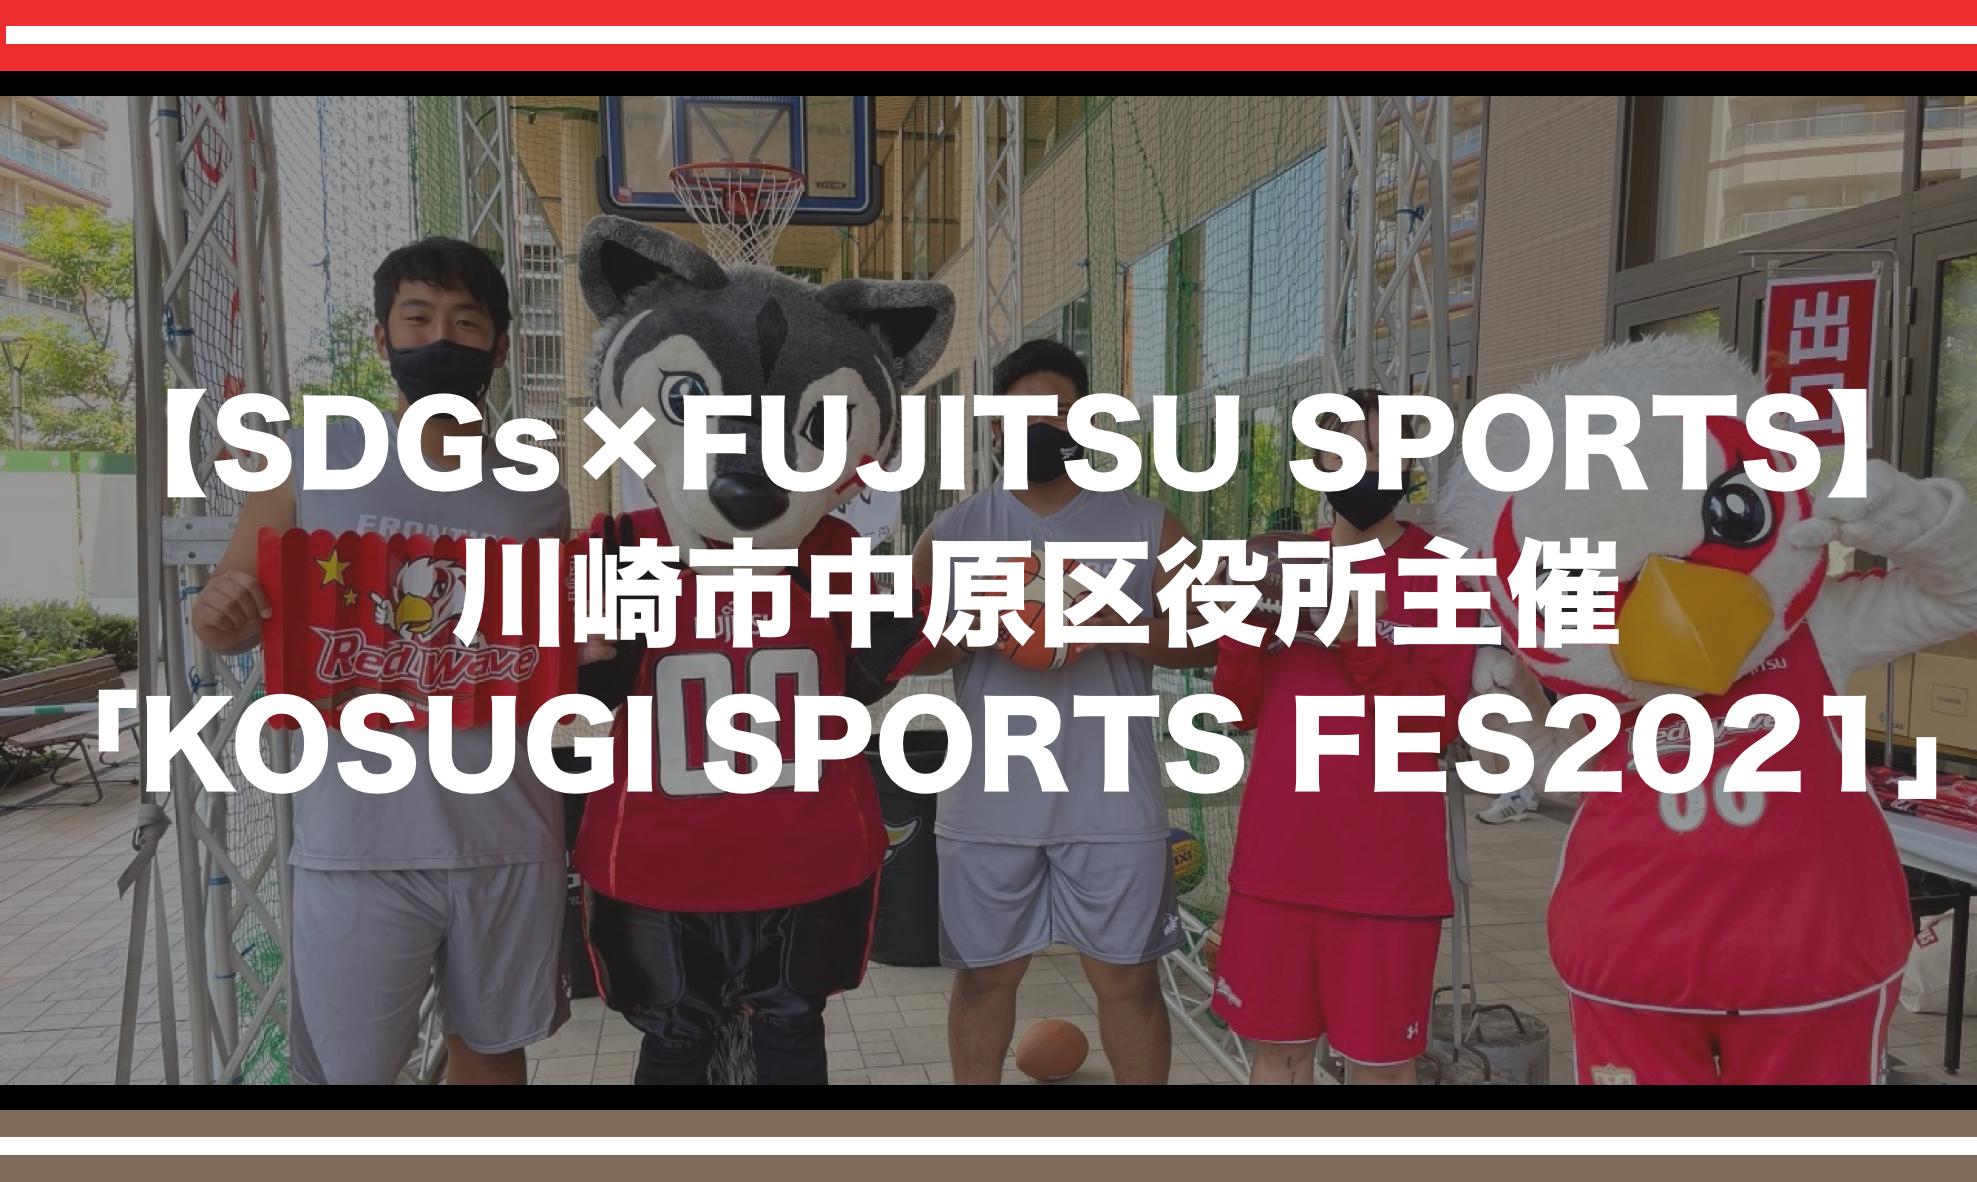 【SDGs×FUJITSU SPORTS】 川崎市中原区役所主催「KOSUGI SPORTS FES2021」に出展協力